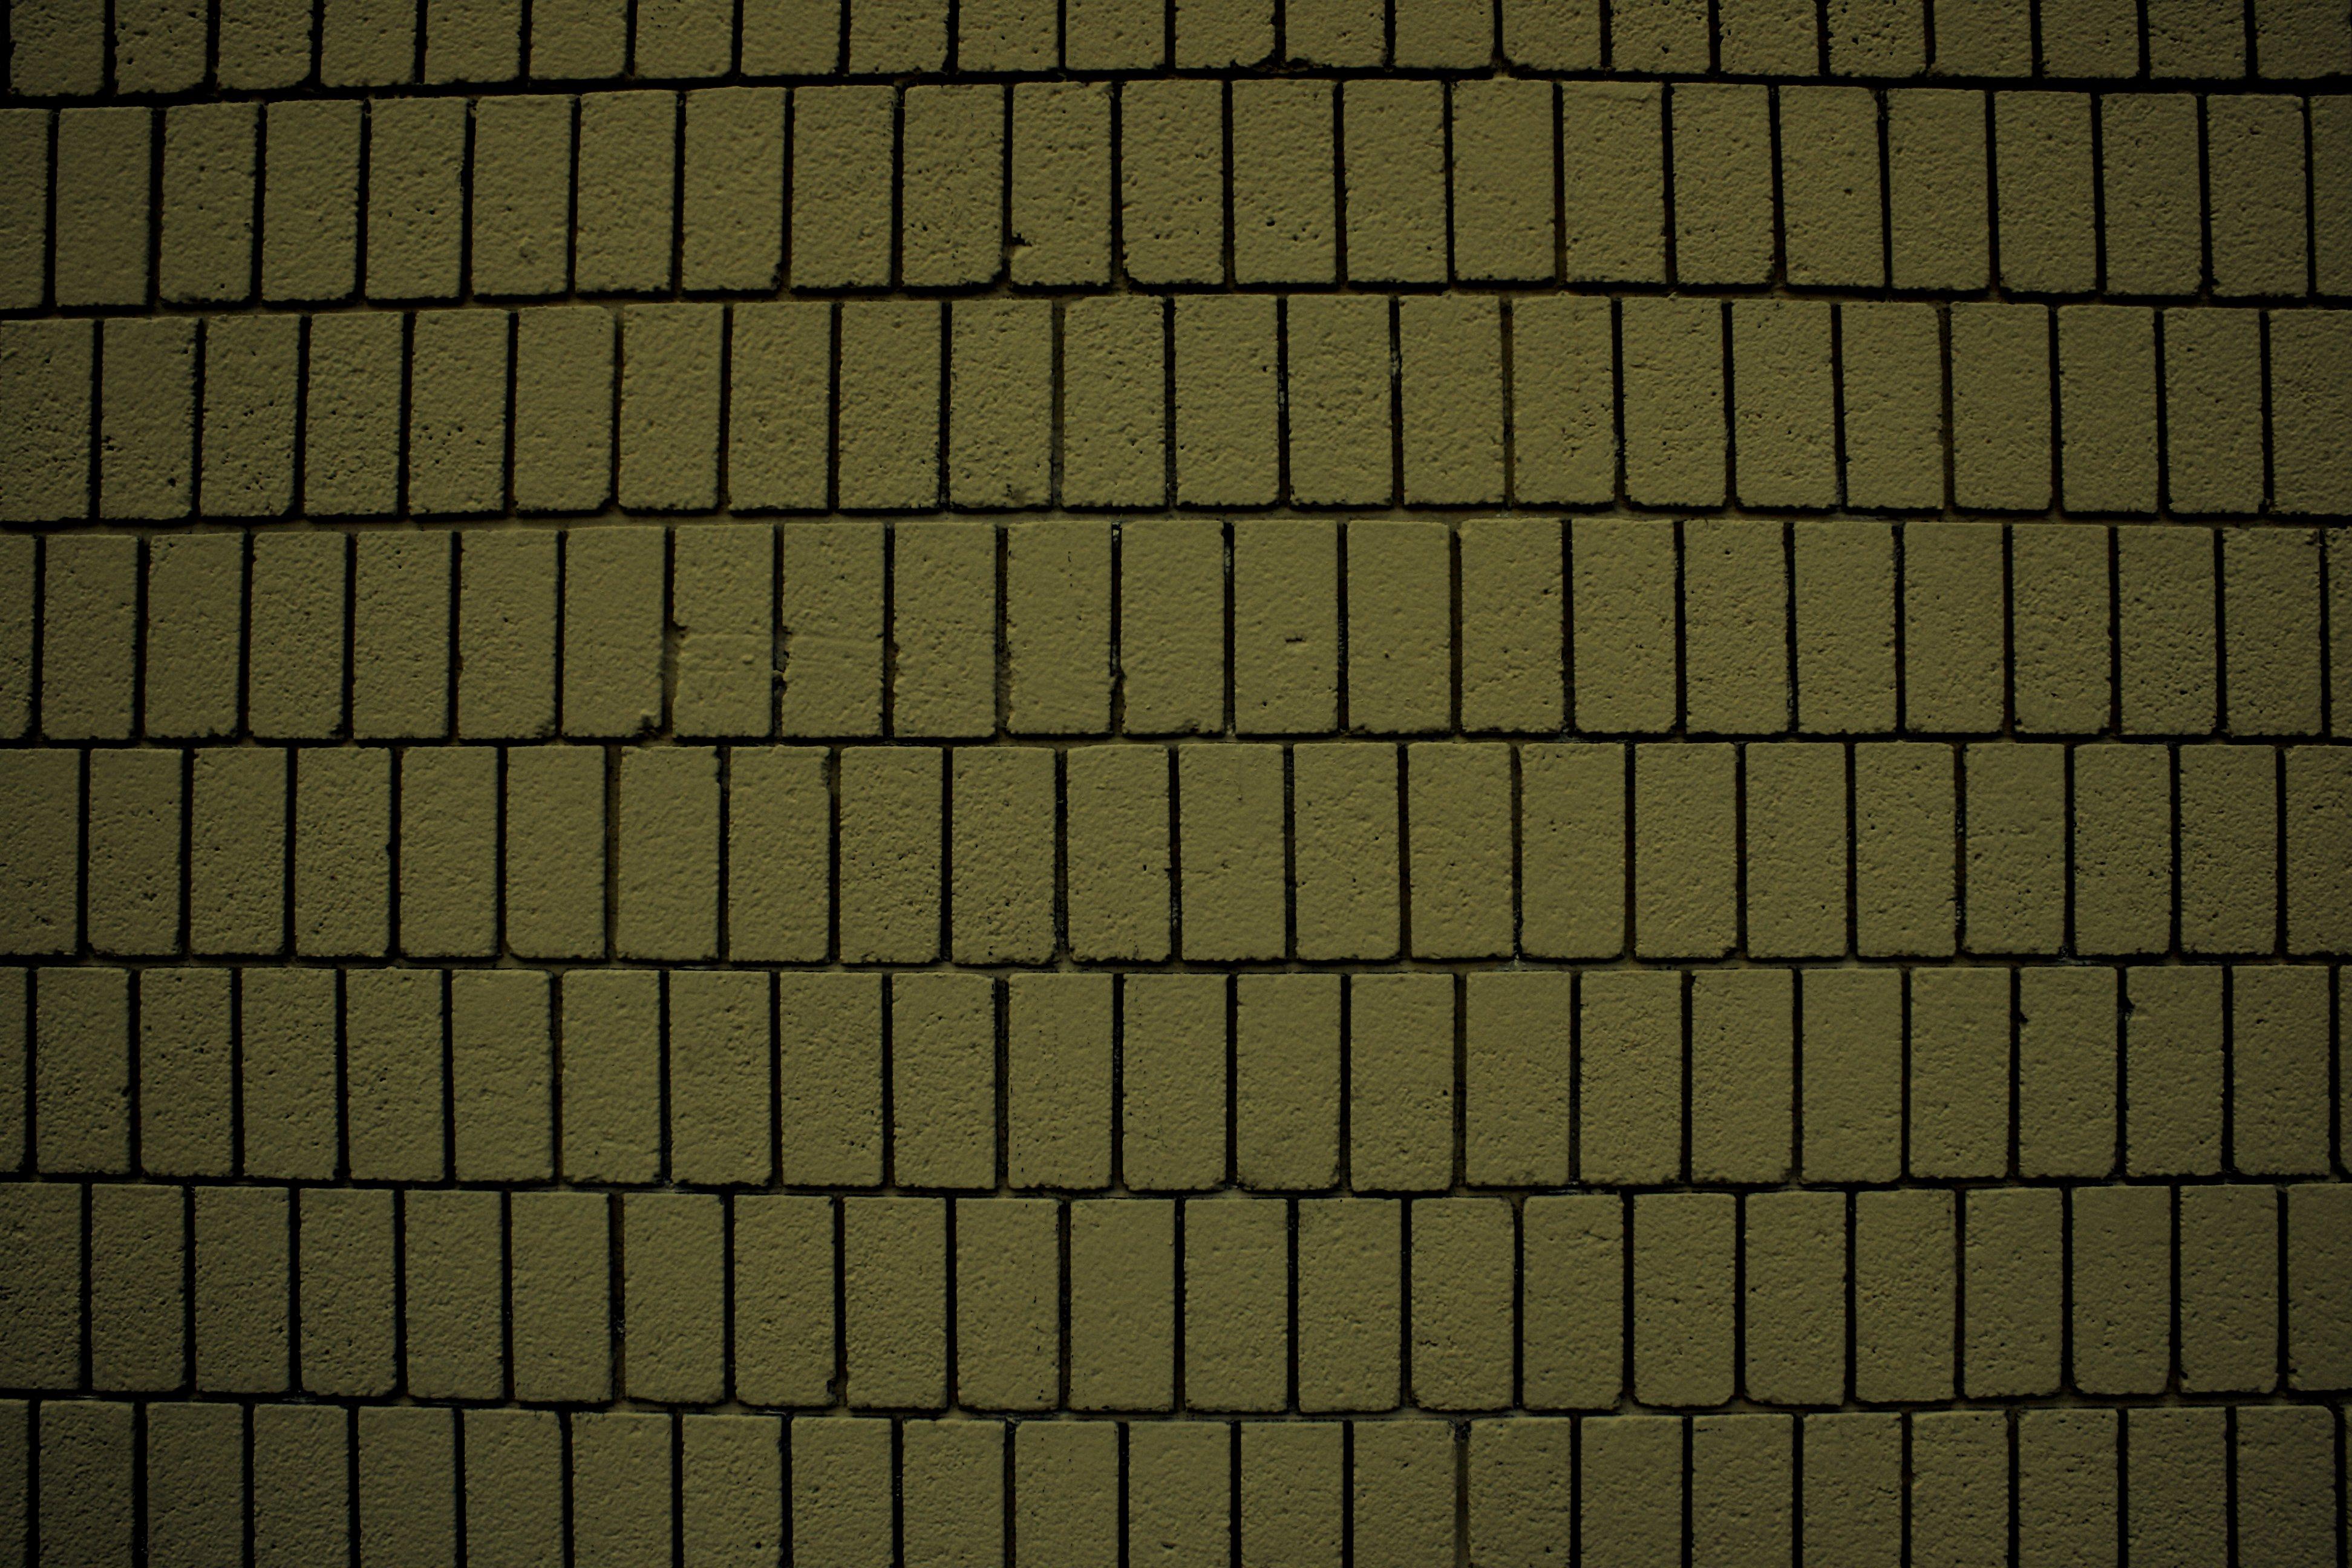 Khaki olive green brick wall texture with vertical bricks for Khaki green walls